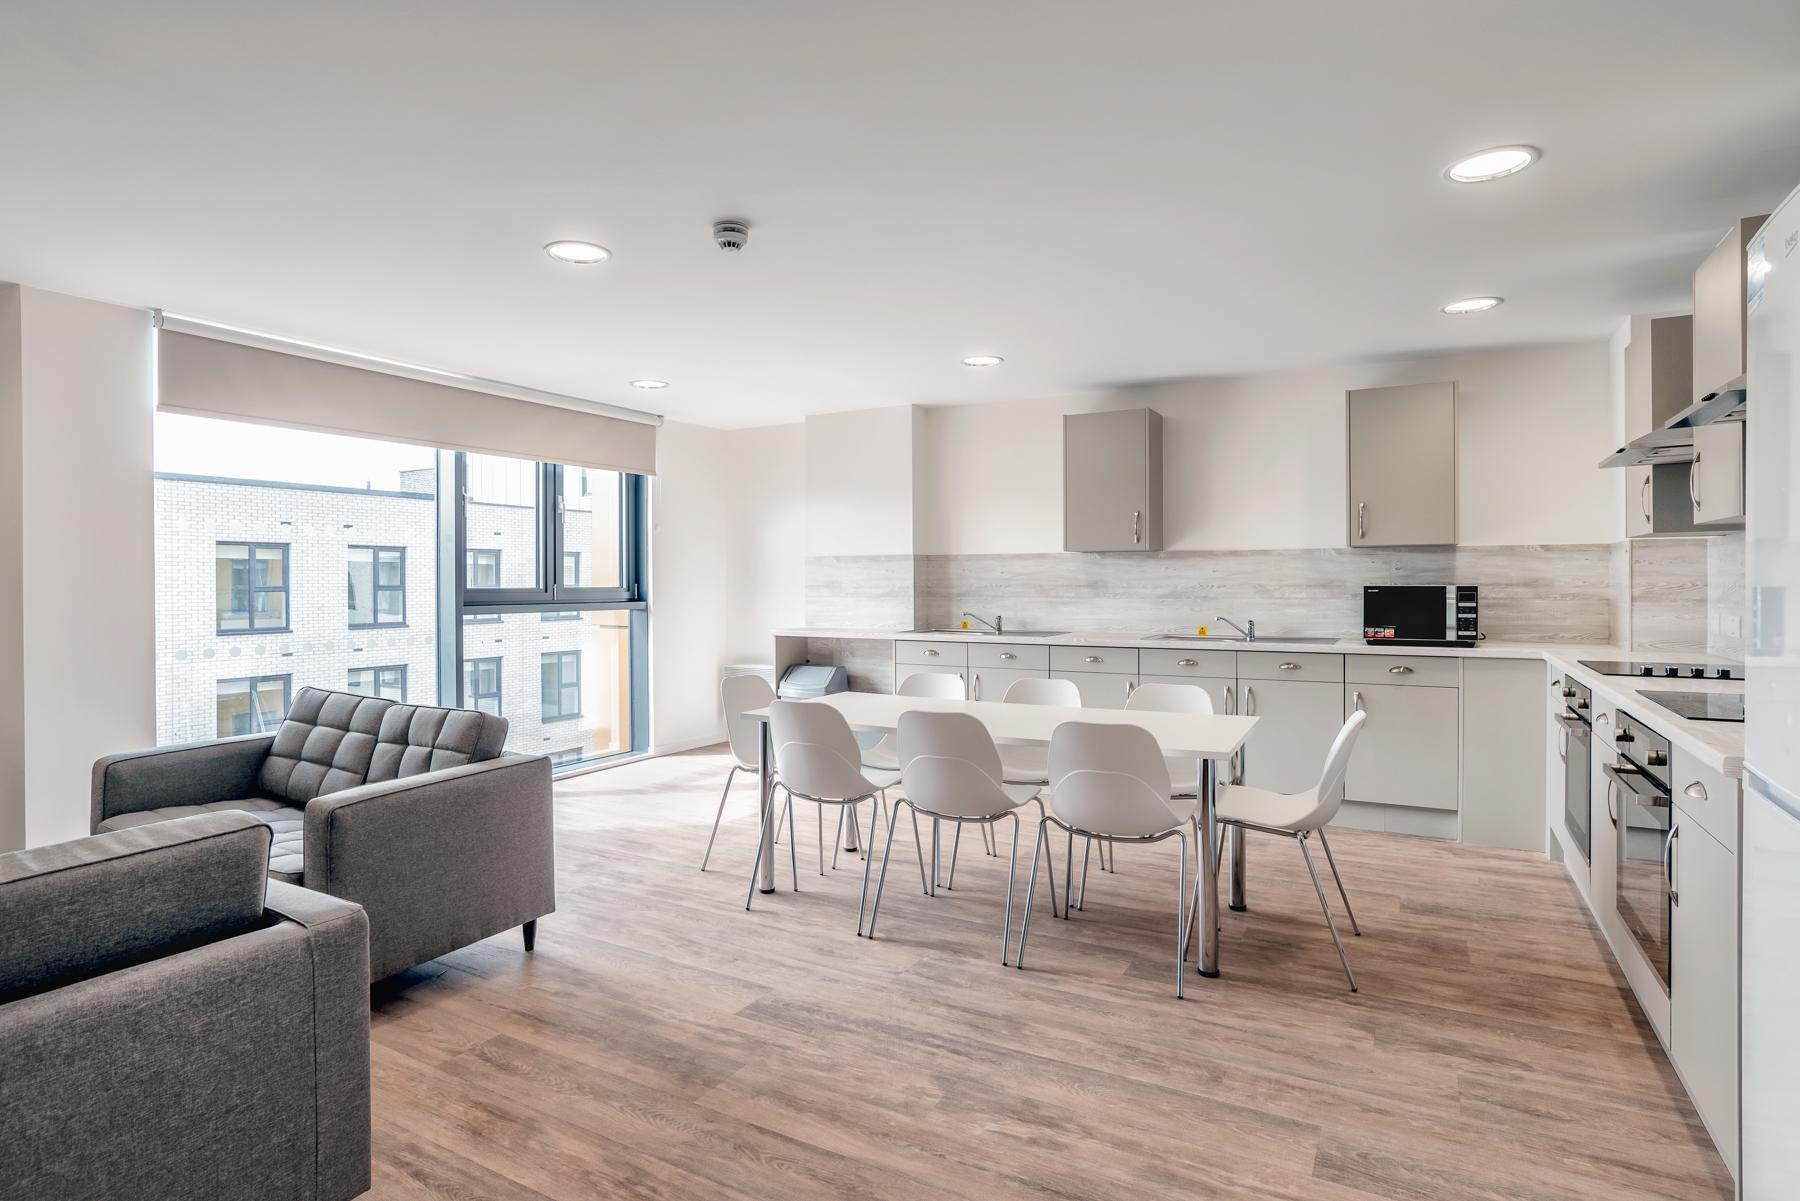 Pittodrie Street Phase 2 | Robertson Construction | Aberdeen, Scotland